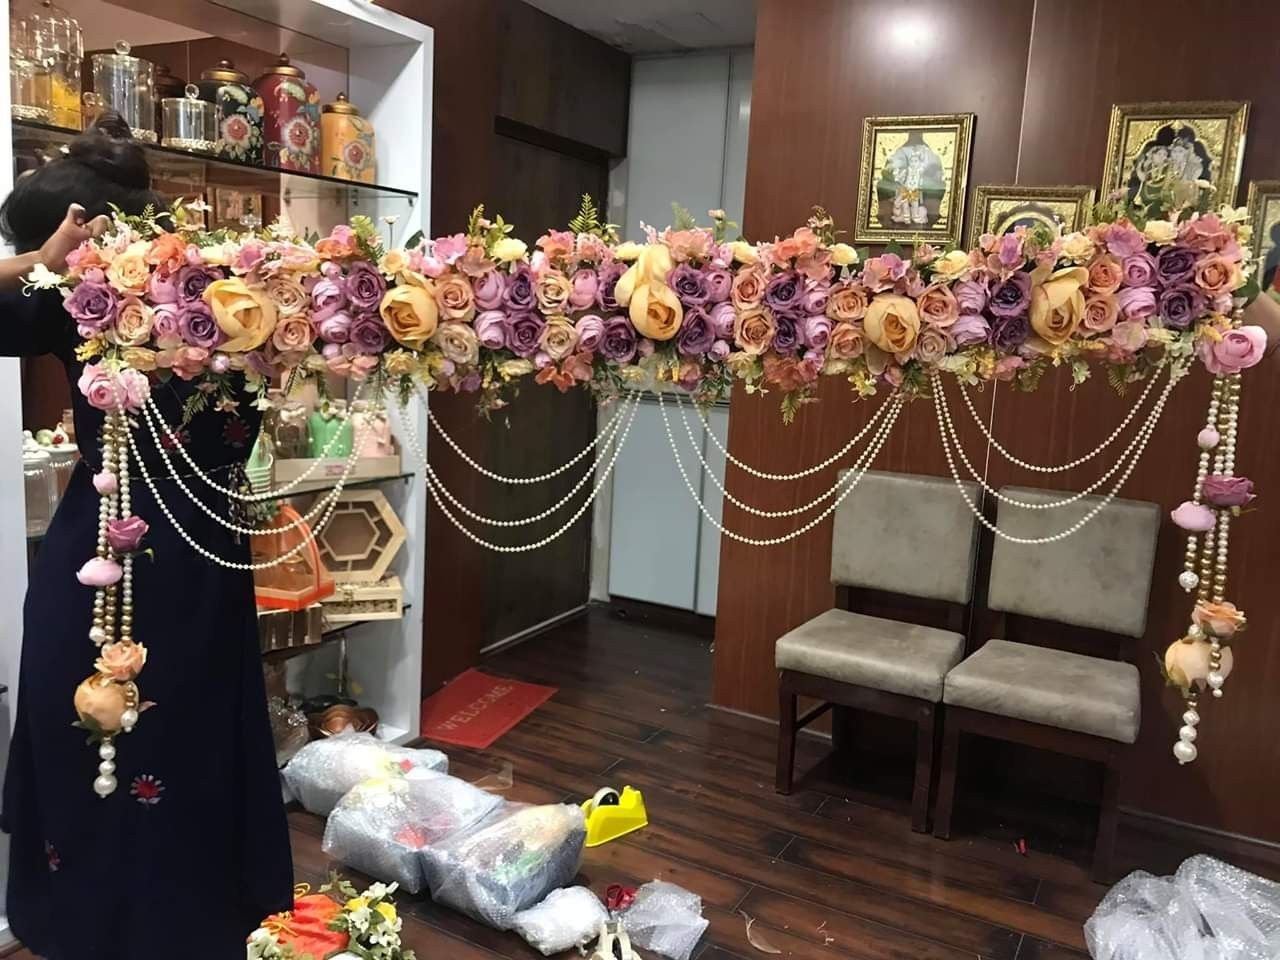 Pin by Divya Agrawal on torans | Diwali decoration items ...